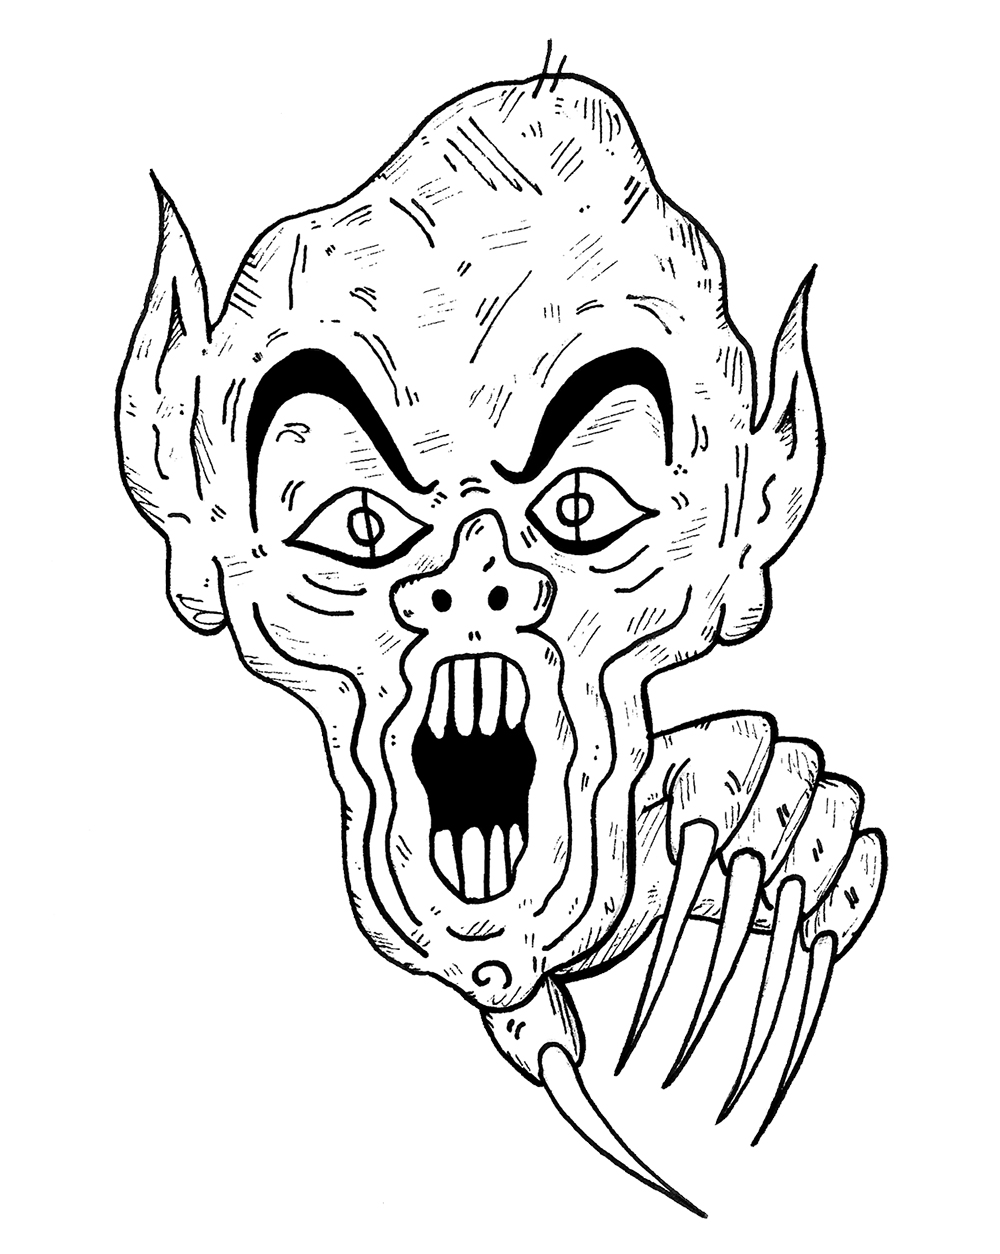 Goblin1.jpg